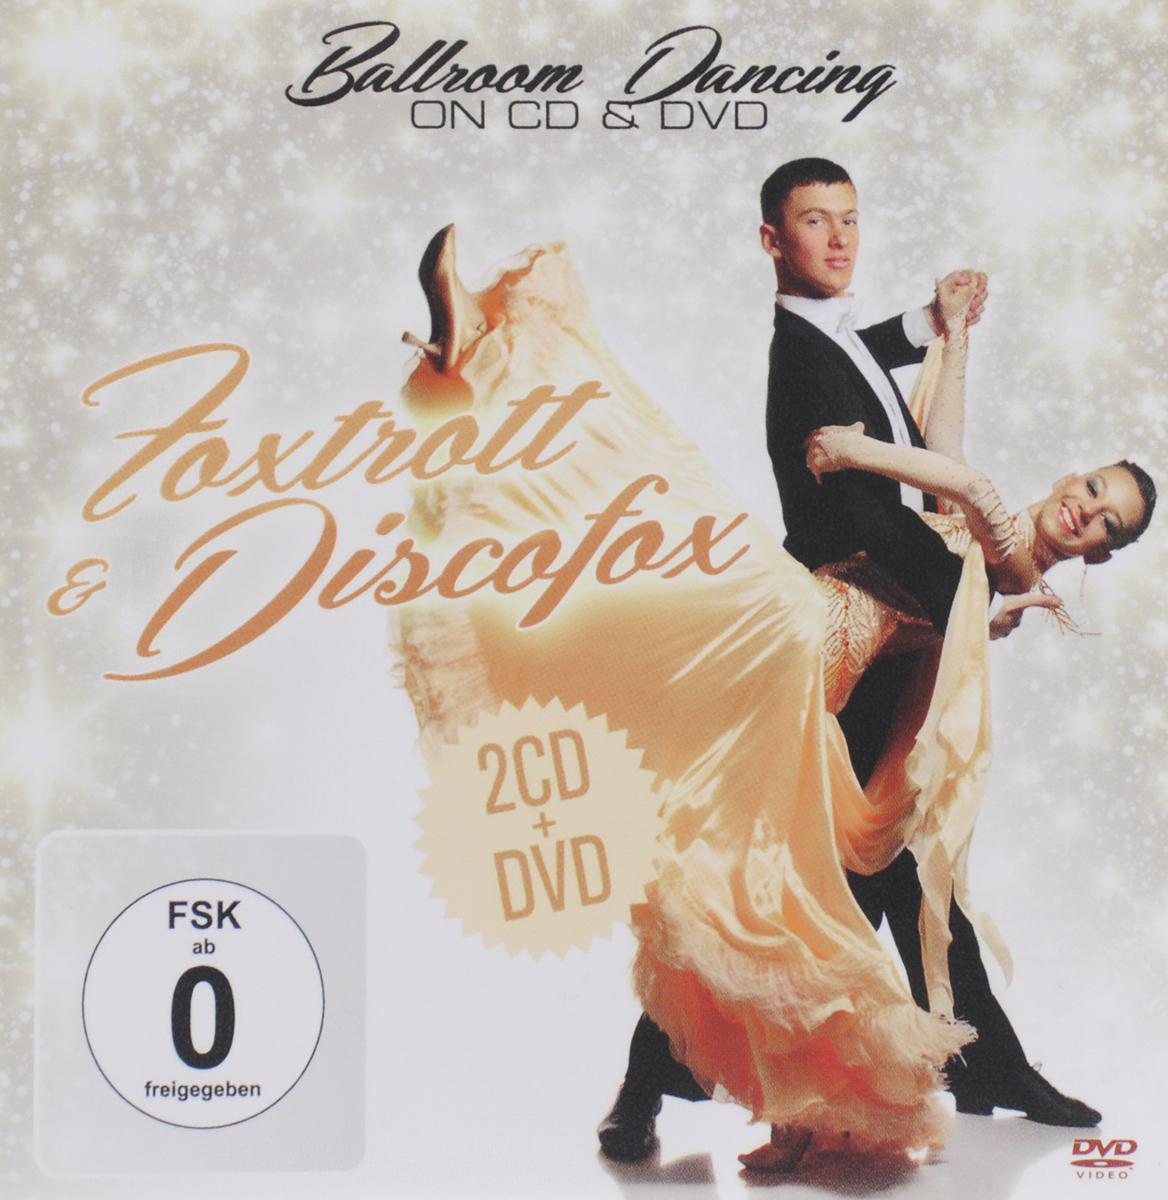 Ballroom Dancing. Foxtrott & Discofox (2 CD + DVD) блокада 2 dvd